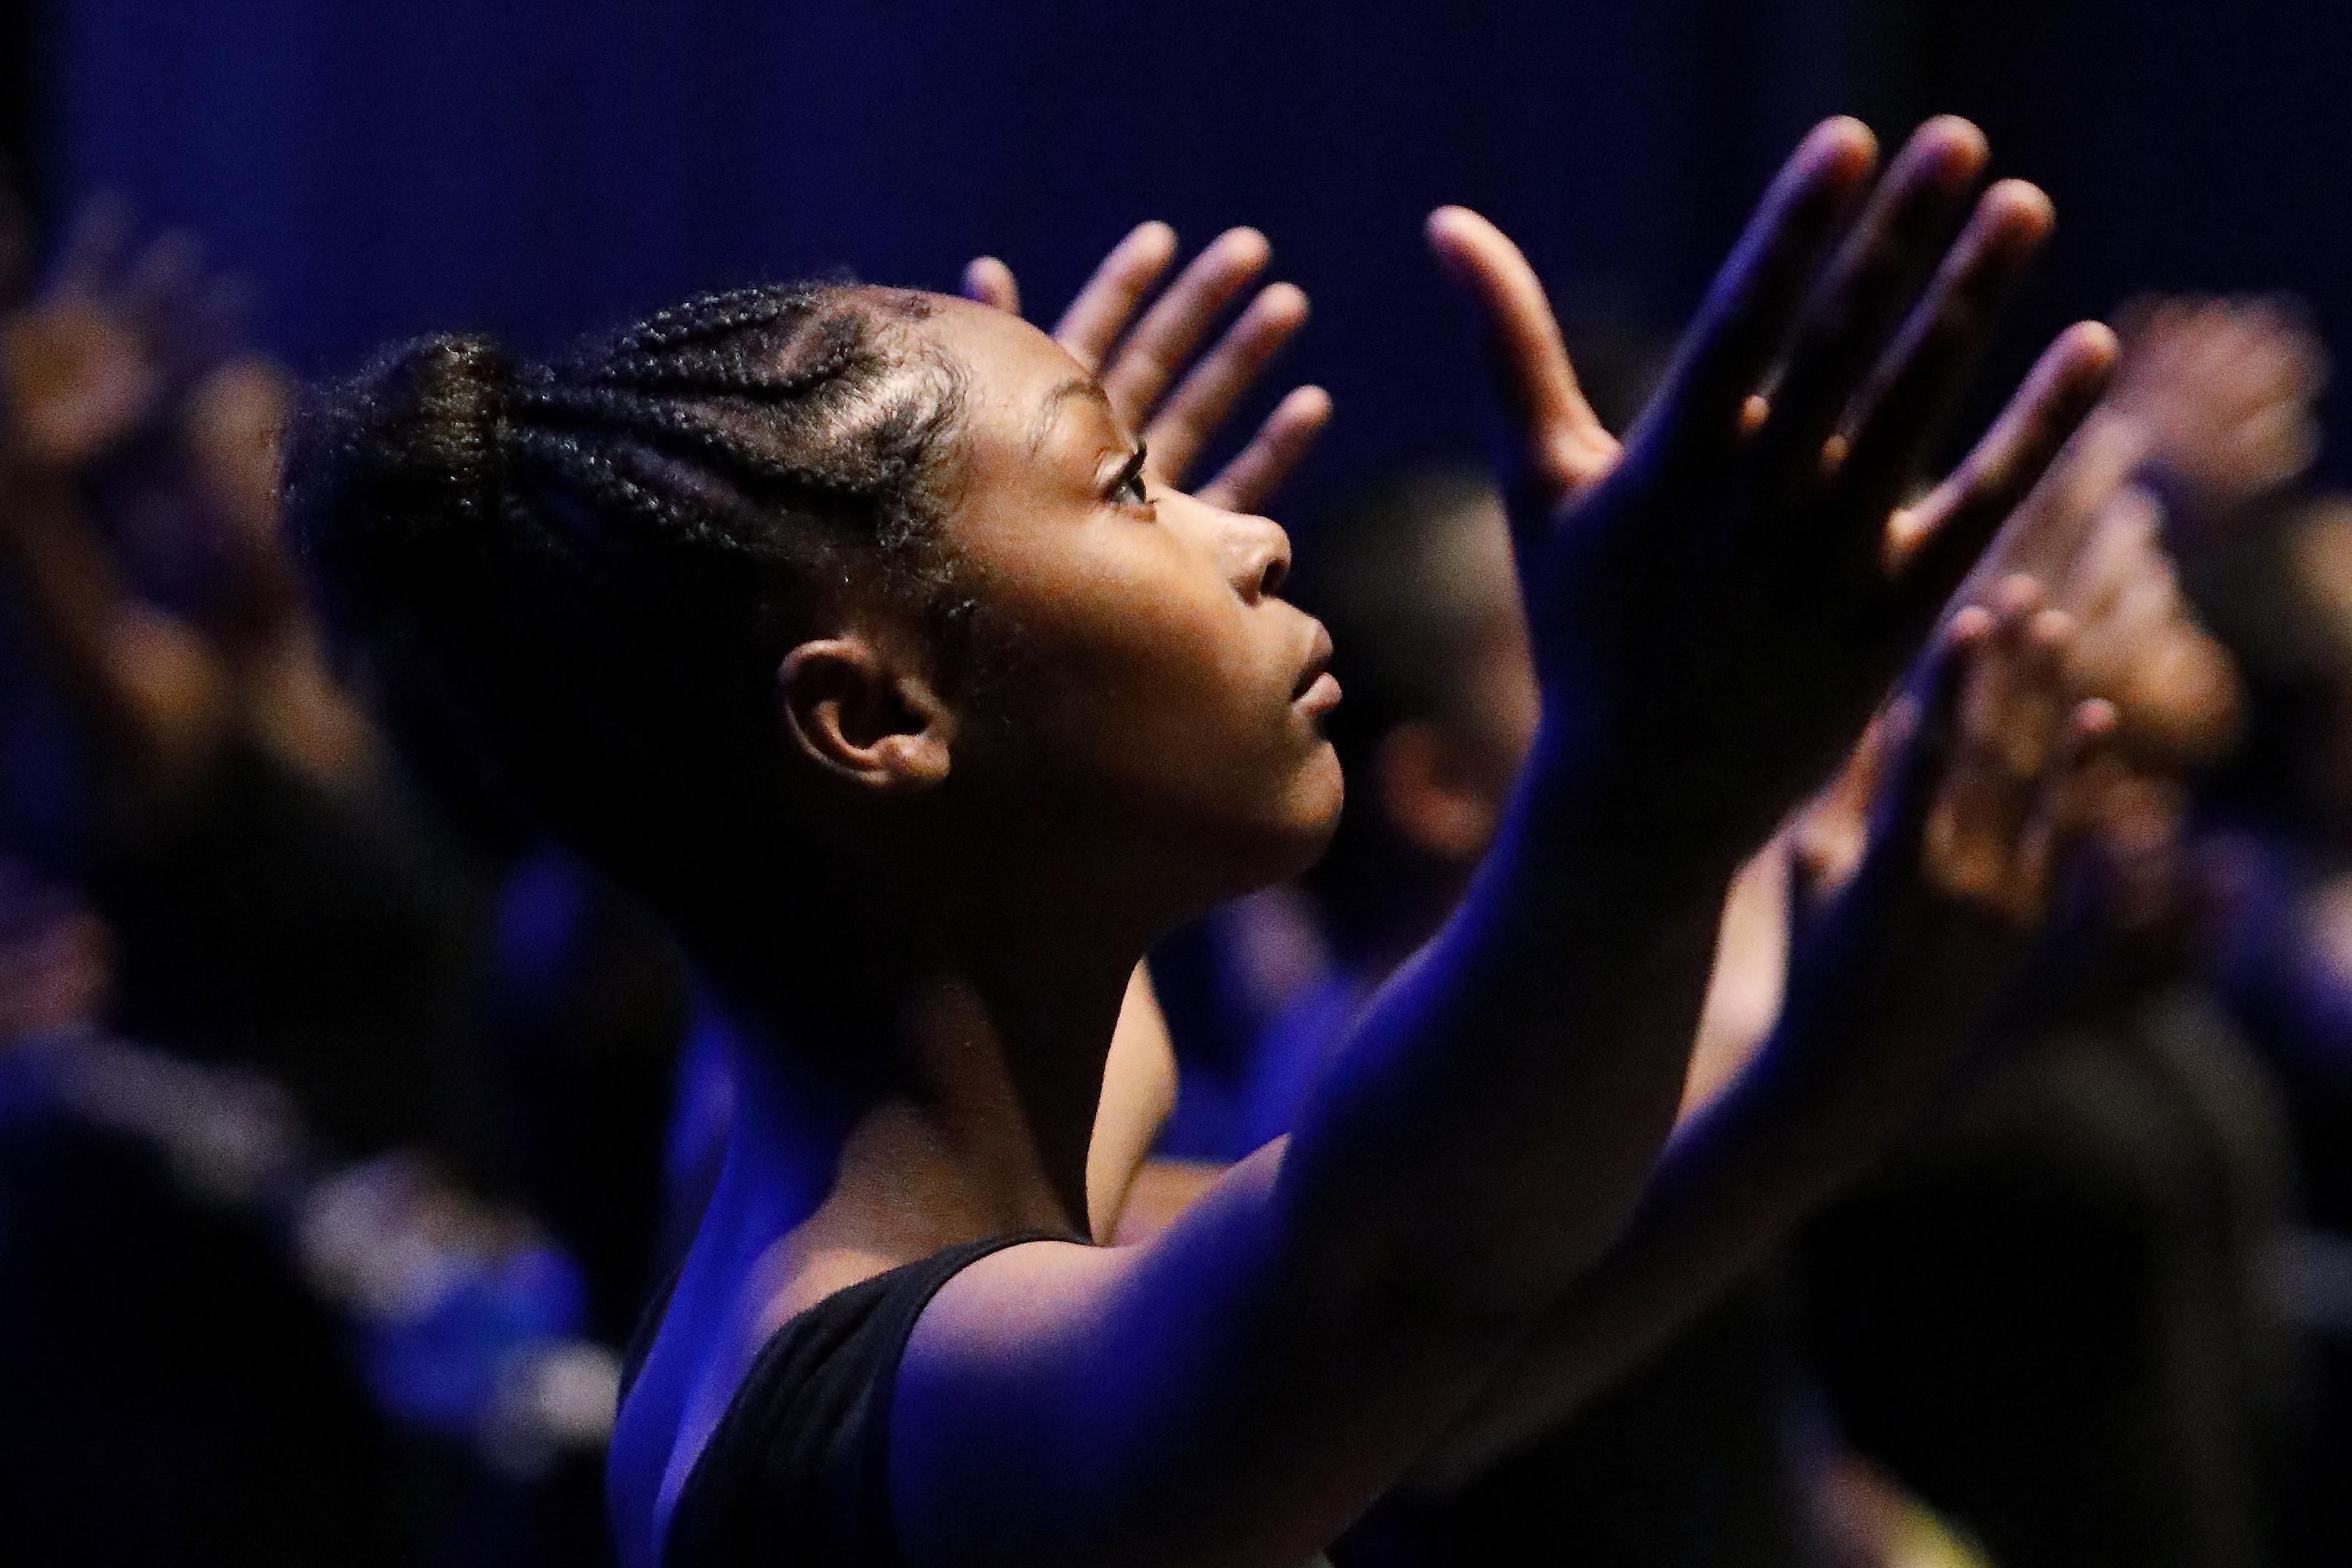 Summer AileyCamp provides dance training, life skills